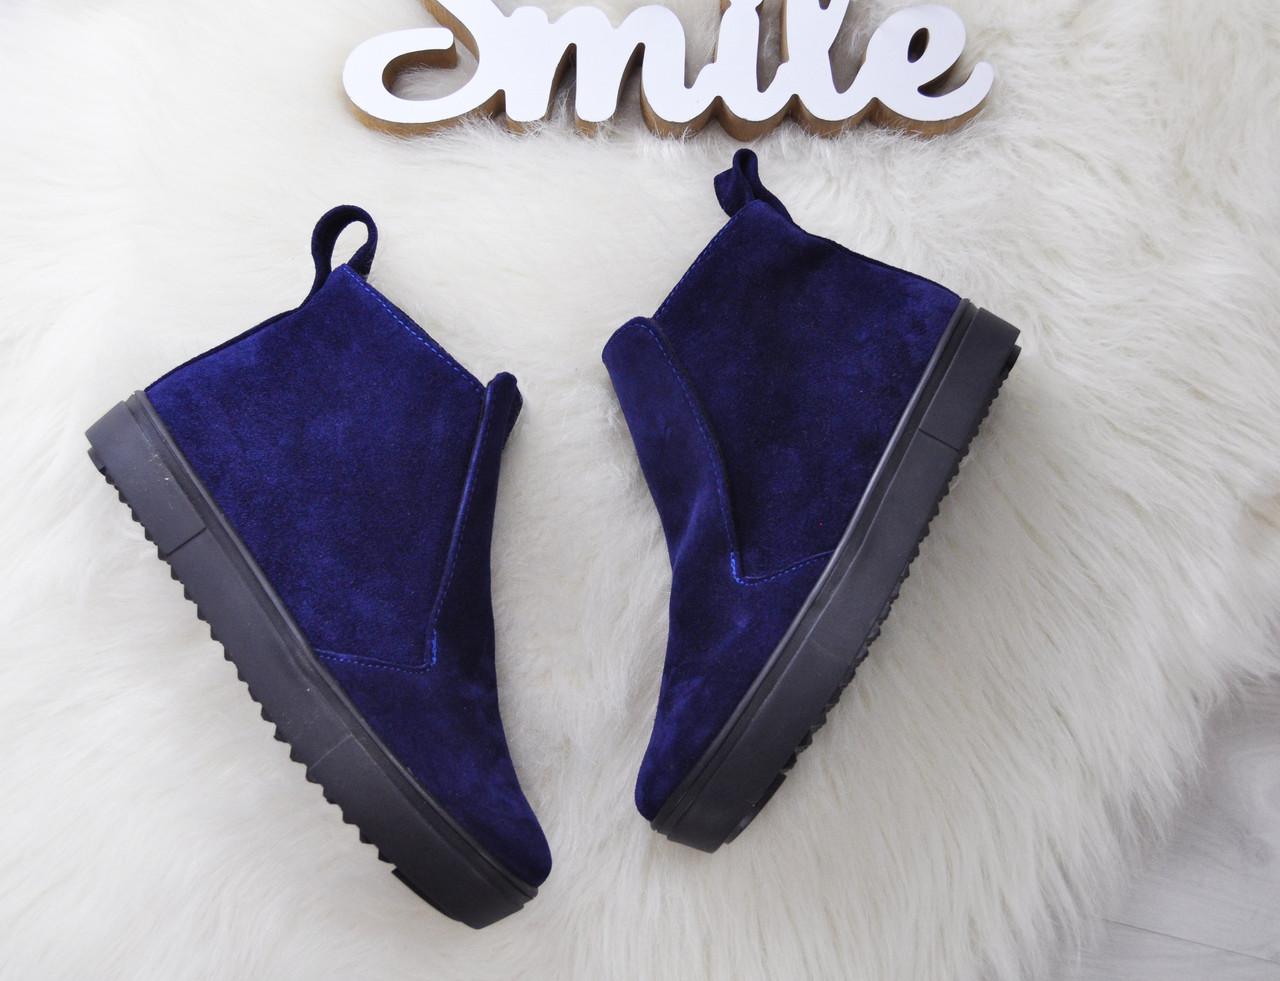 Замшевые ботинки на низком ходу 36-40 р синий